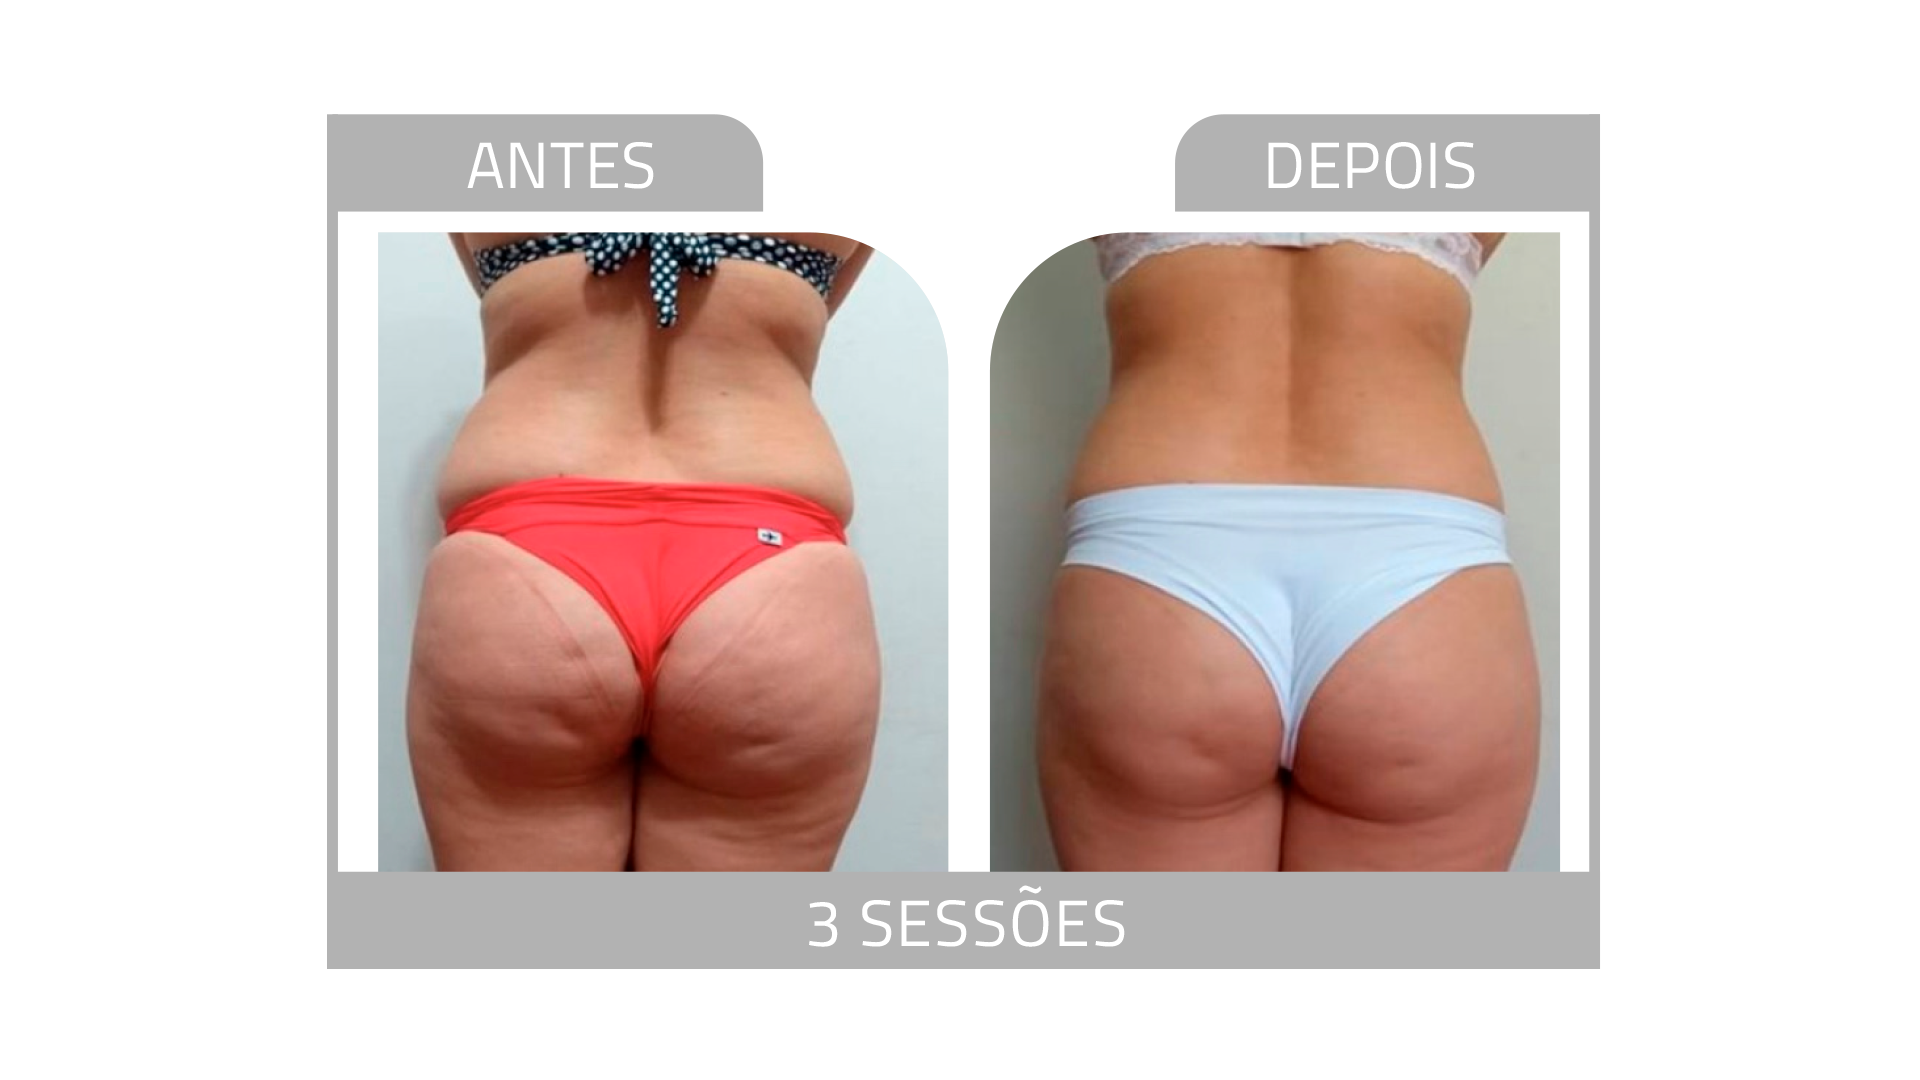 ANTES E DEPOIS LG 13.png